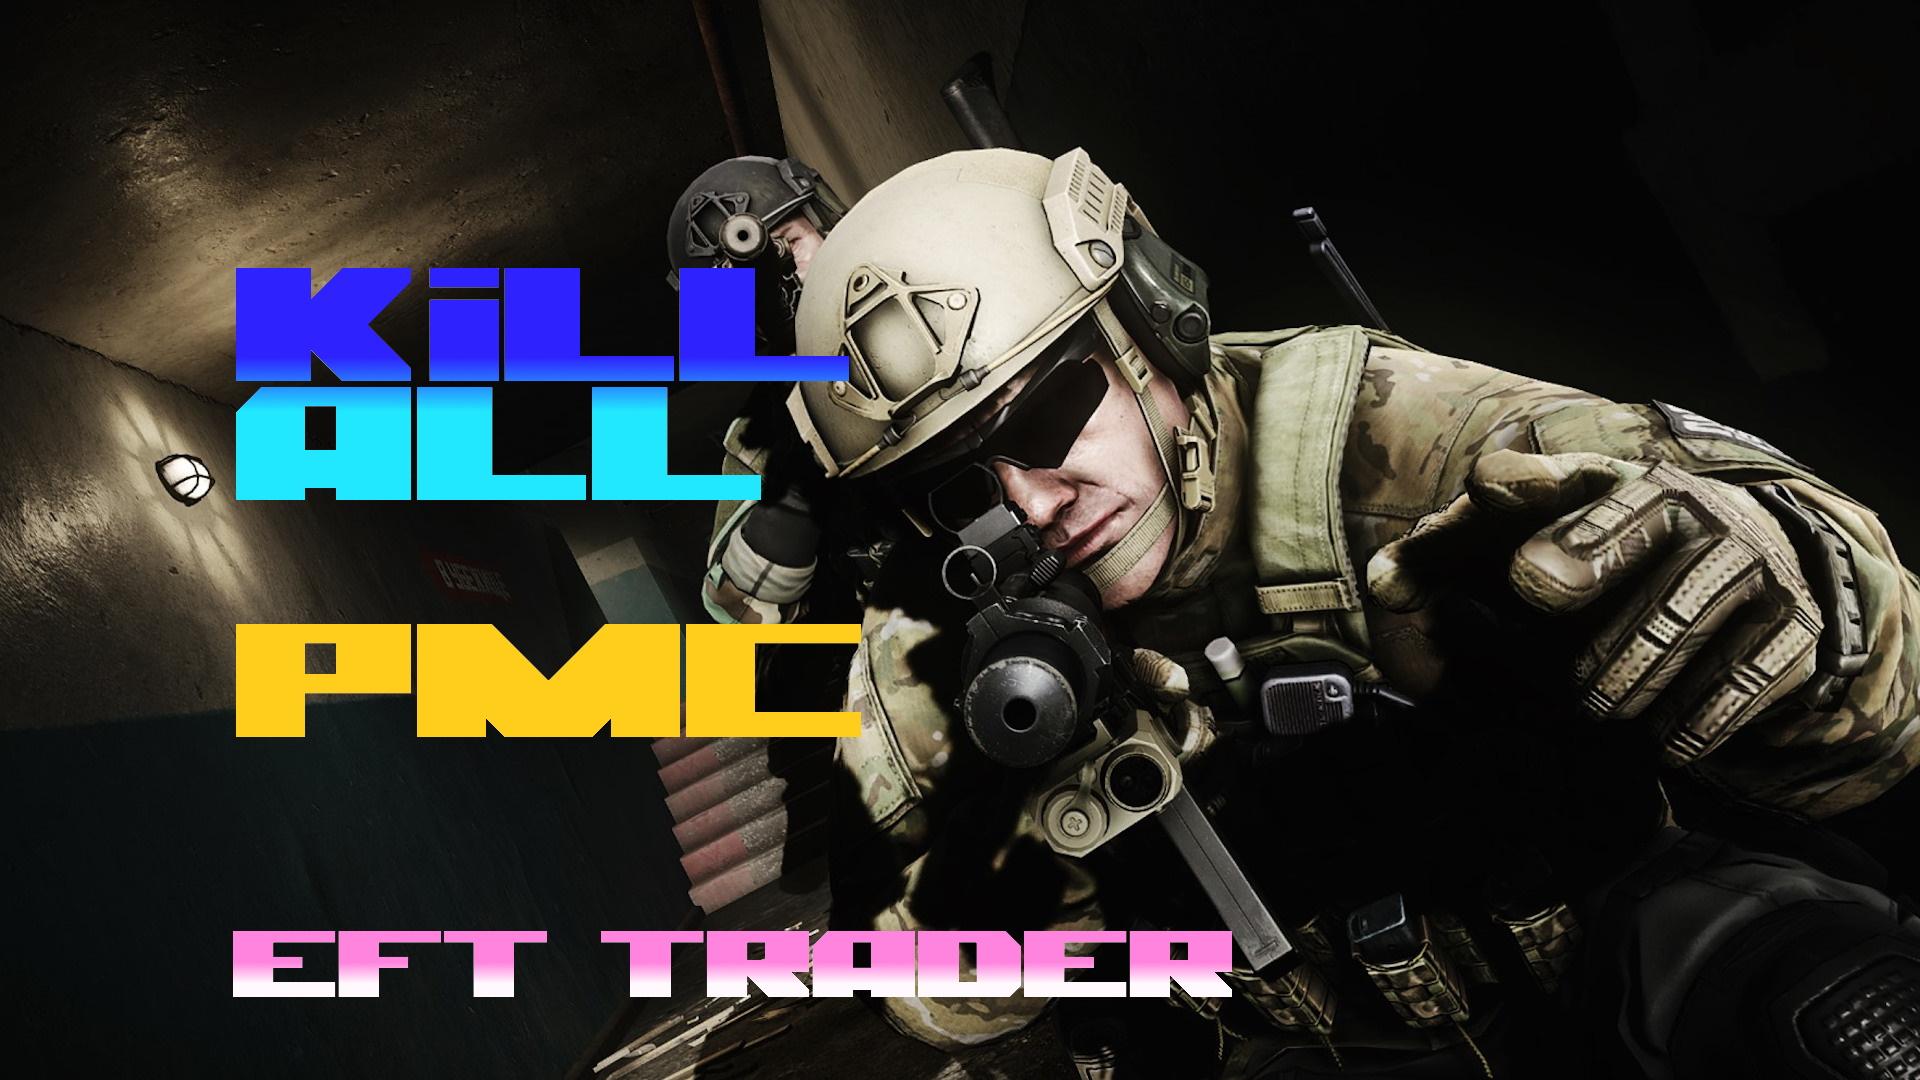 ❤️ KILL ALL PMC ON Any MAP!❤️UNLOCK ALL DOORS❤️ %100 SAFE